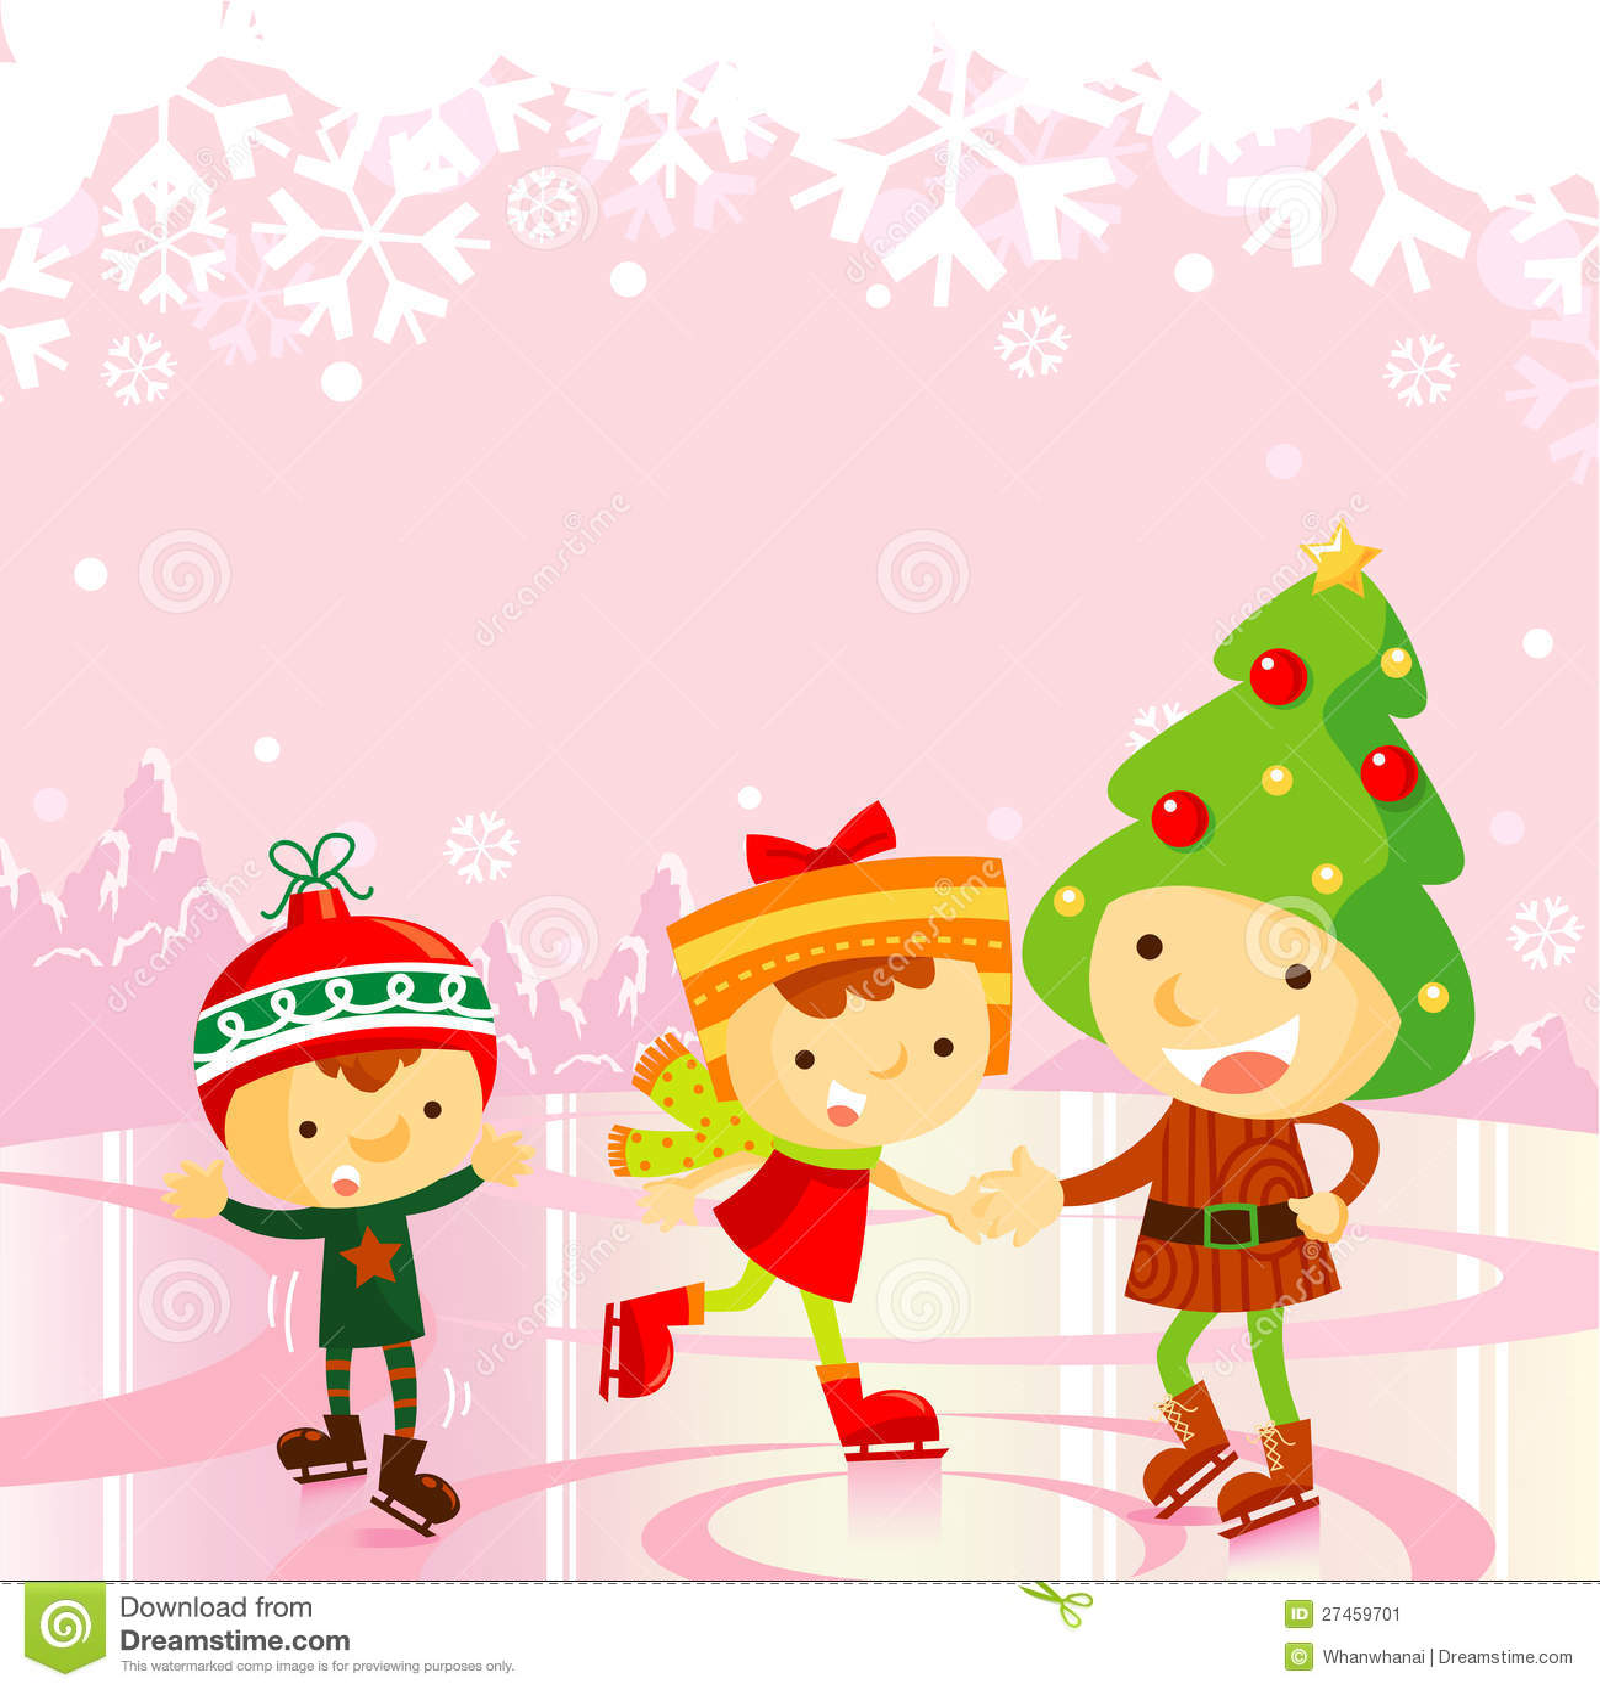 Christmas Ice Skating Rink Decoration: Ice Skating Kids:christmas Holiday Stock Vector